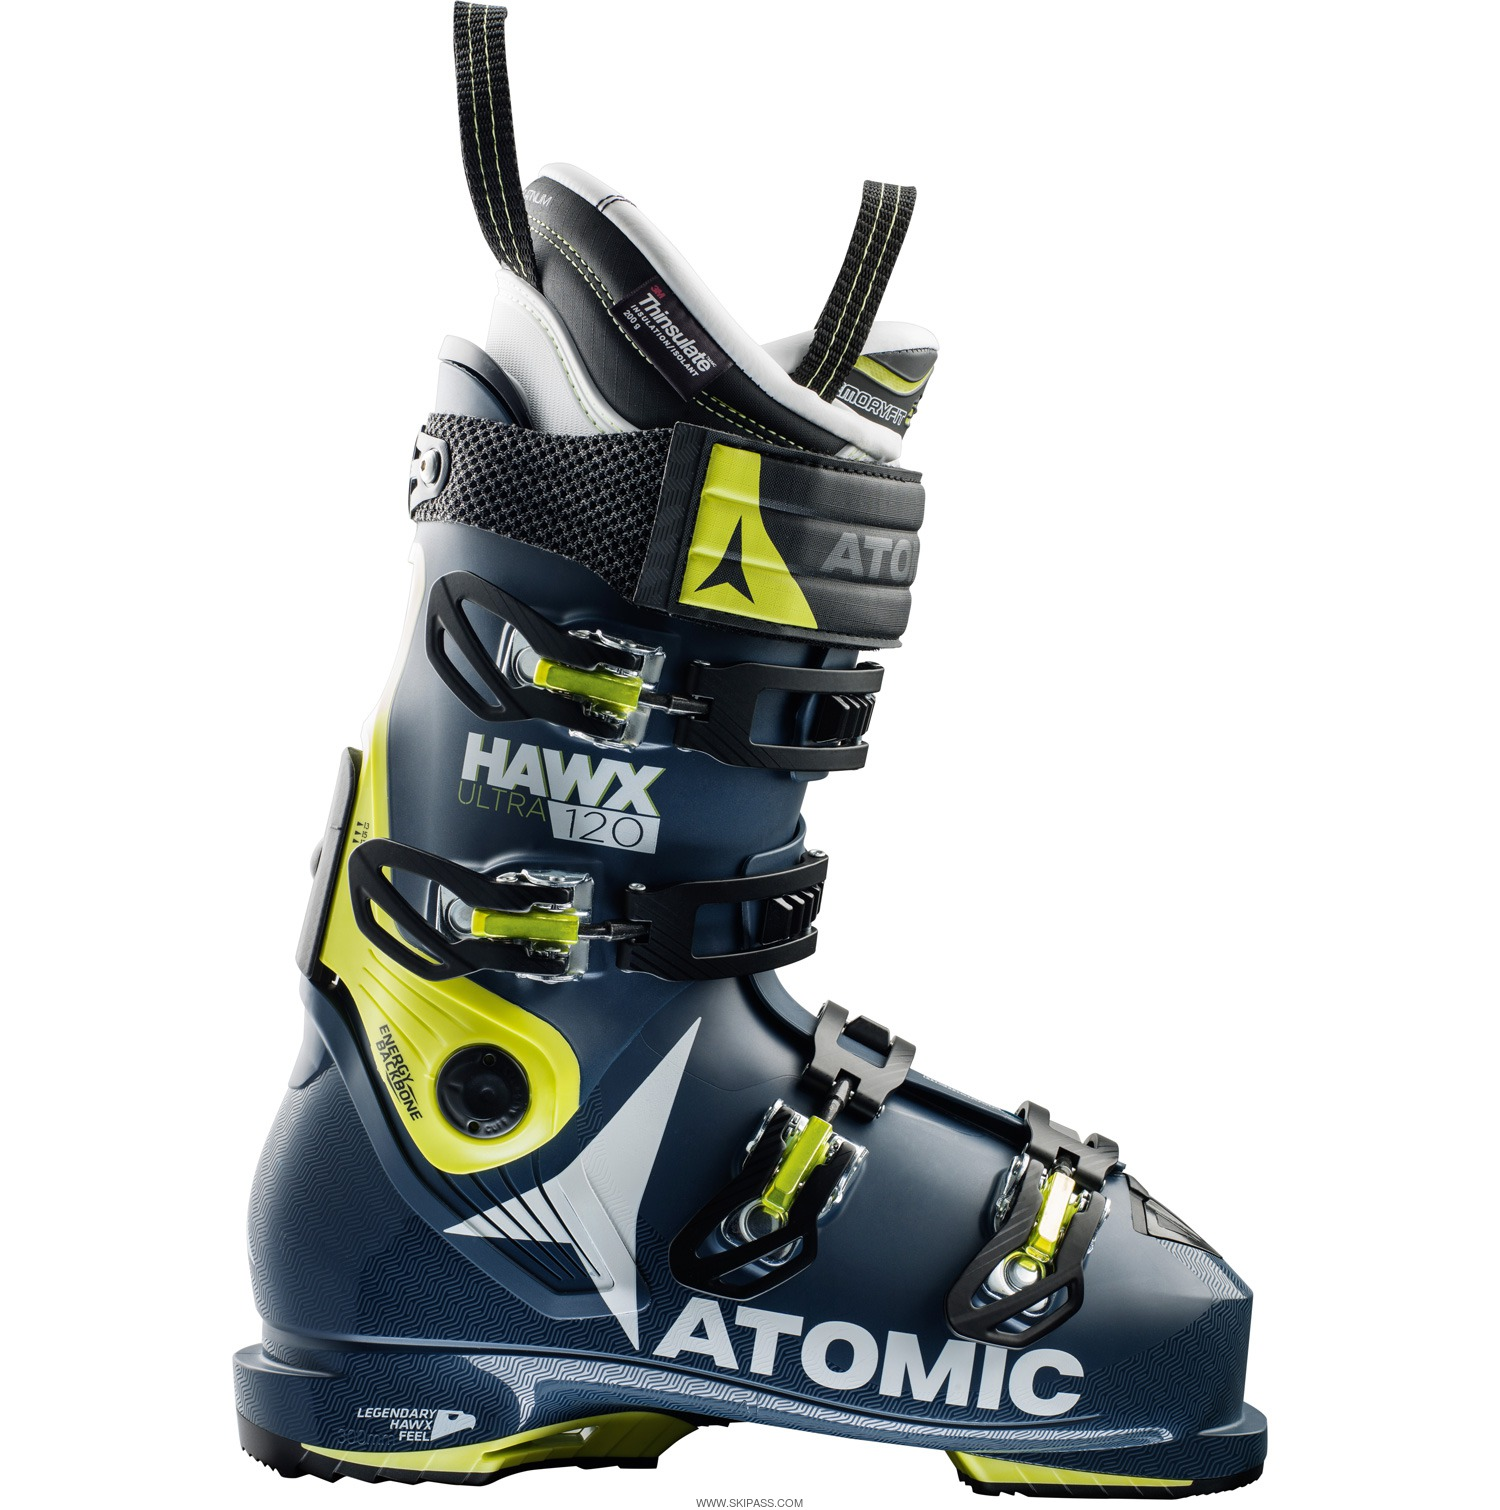 chaussure atomic hawx 120 chaussures de ski homme atomic. Black Bedroom Furniture Sets. Home Design Ideas